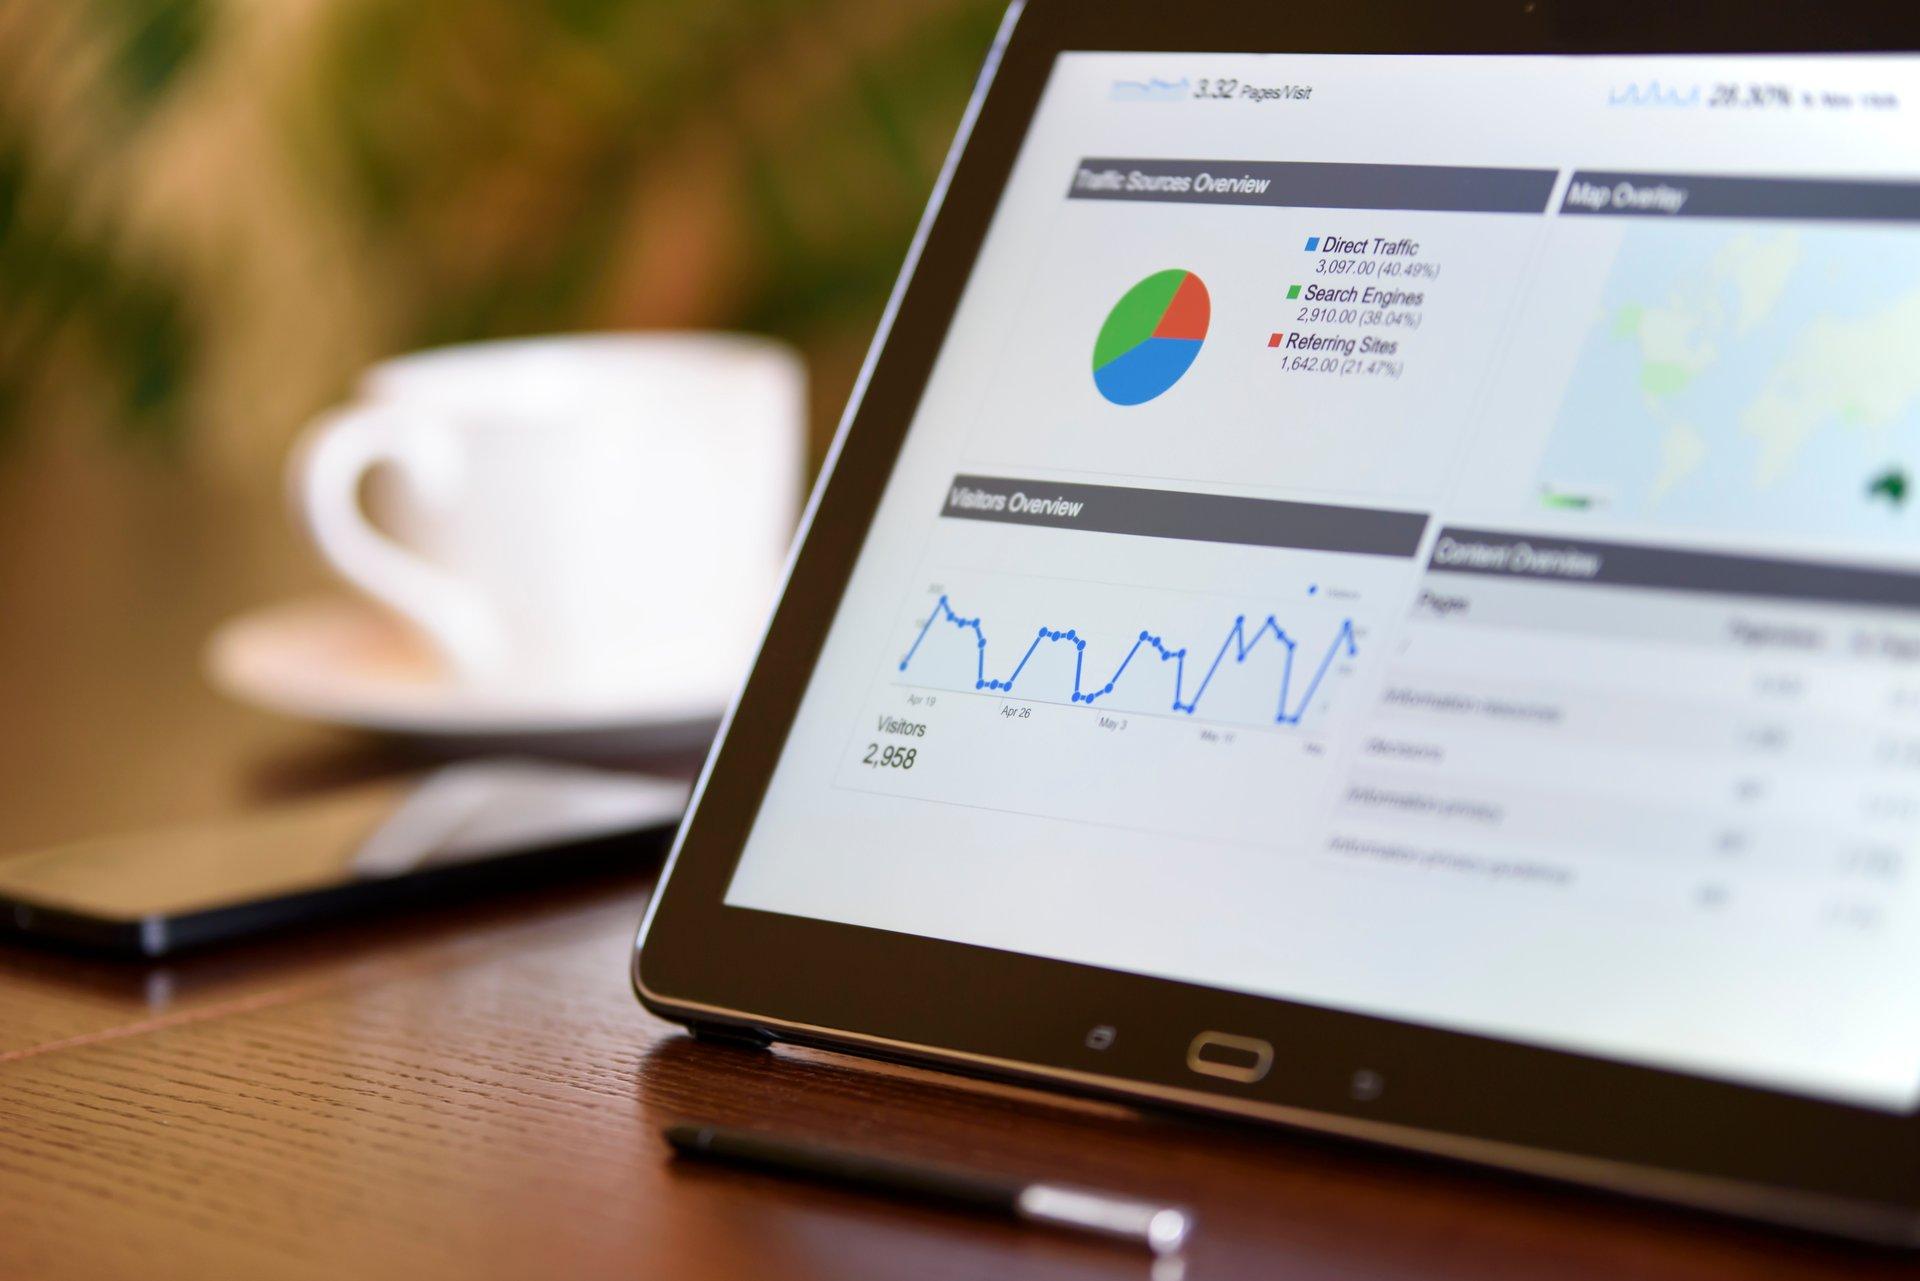 Big Data Marketing highly framented